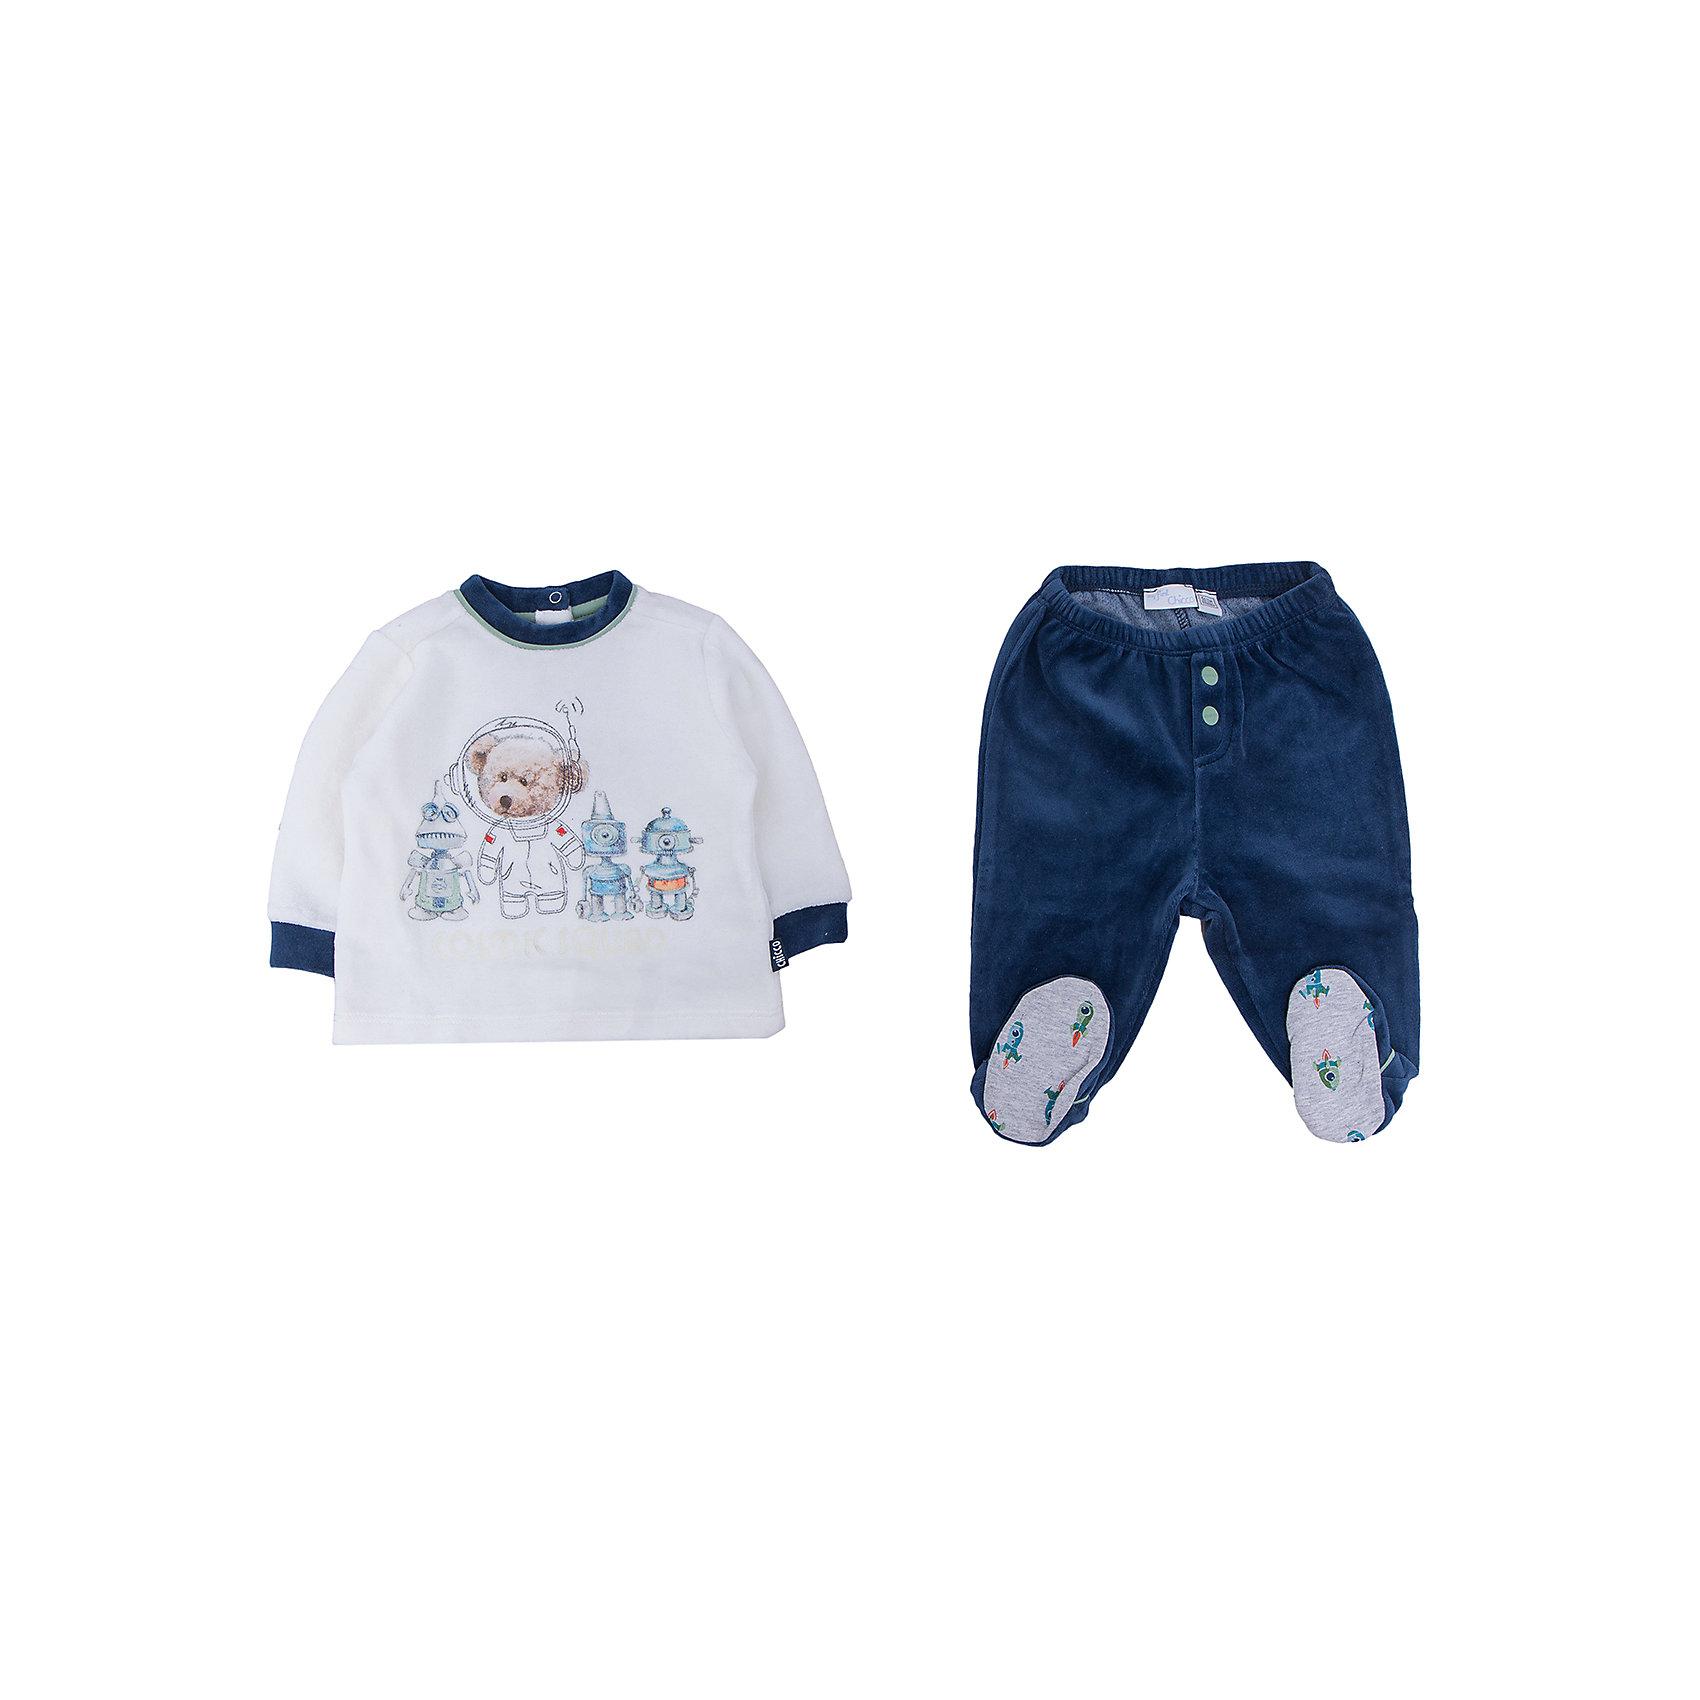 CHICCO Комплект CHICCO для мальчика chicco футболка chicco для мальчика